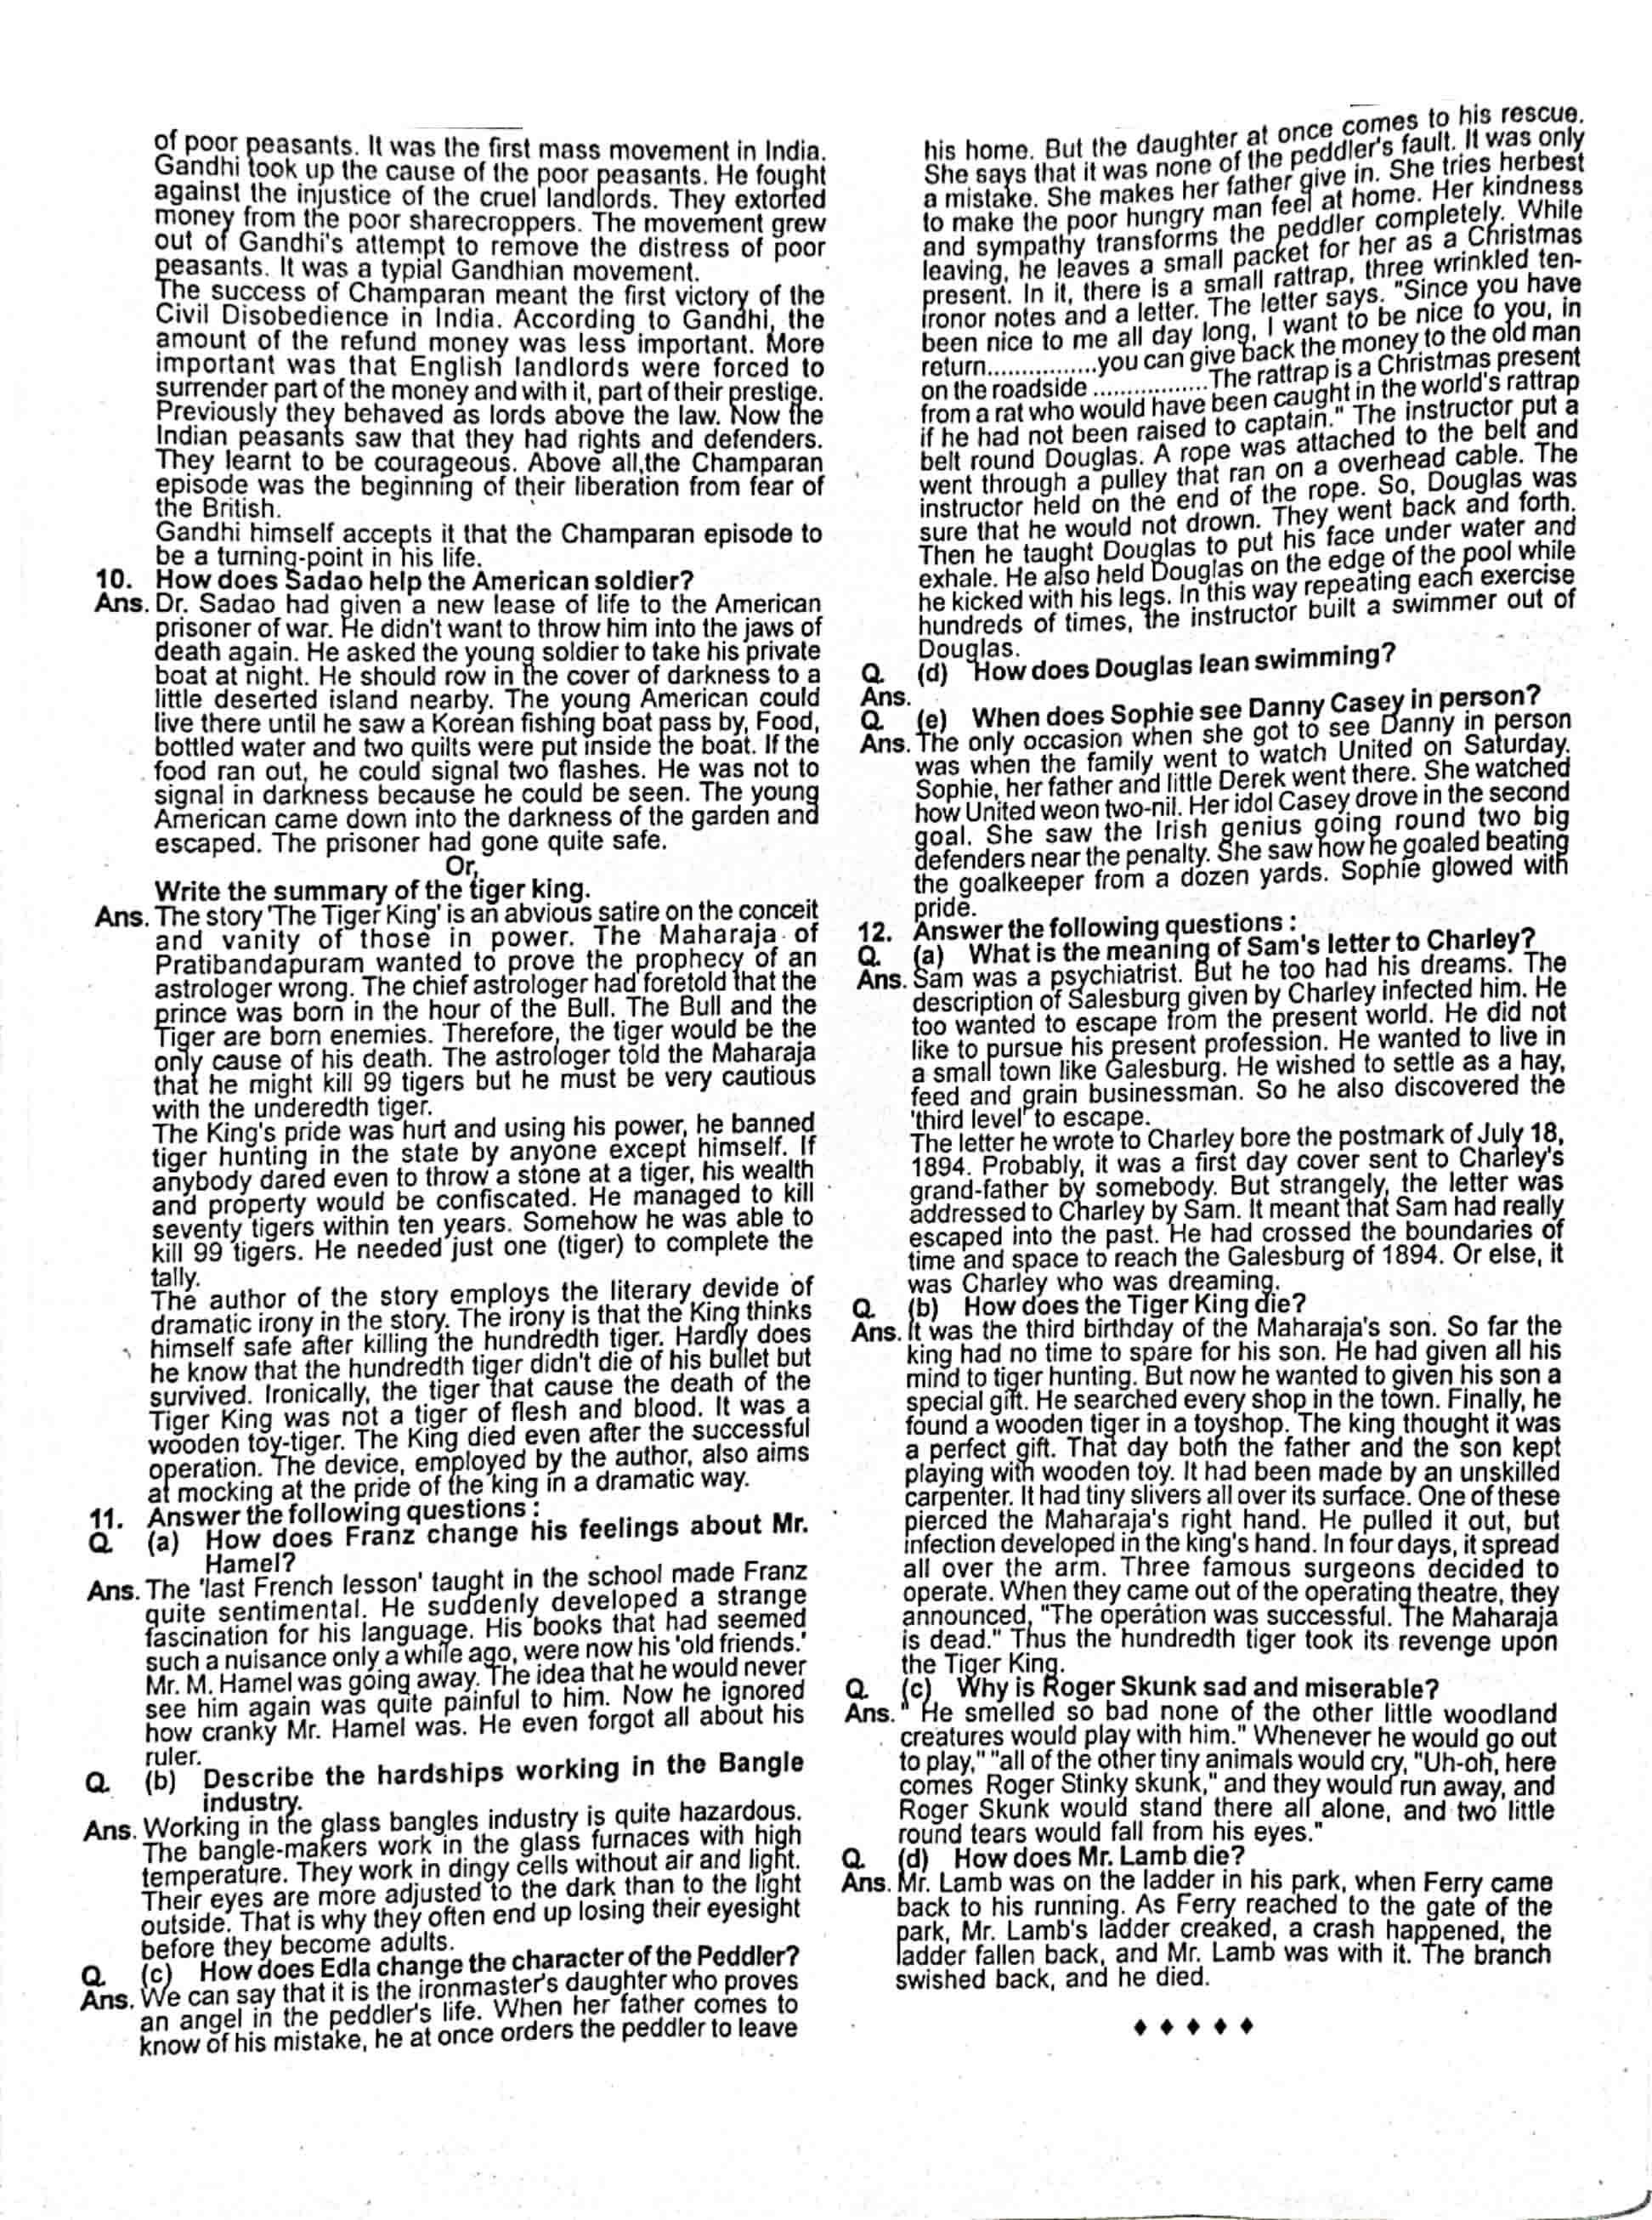 JAC Class 12 english-core 2013 Question Paper 03